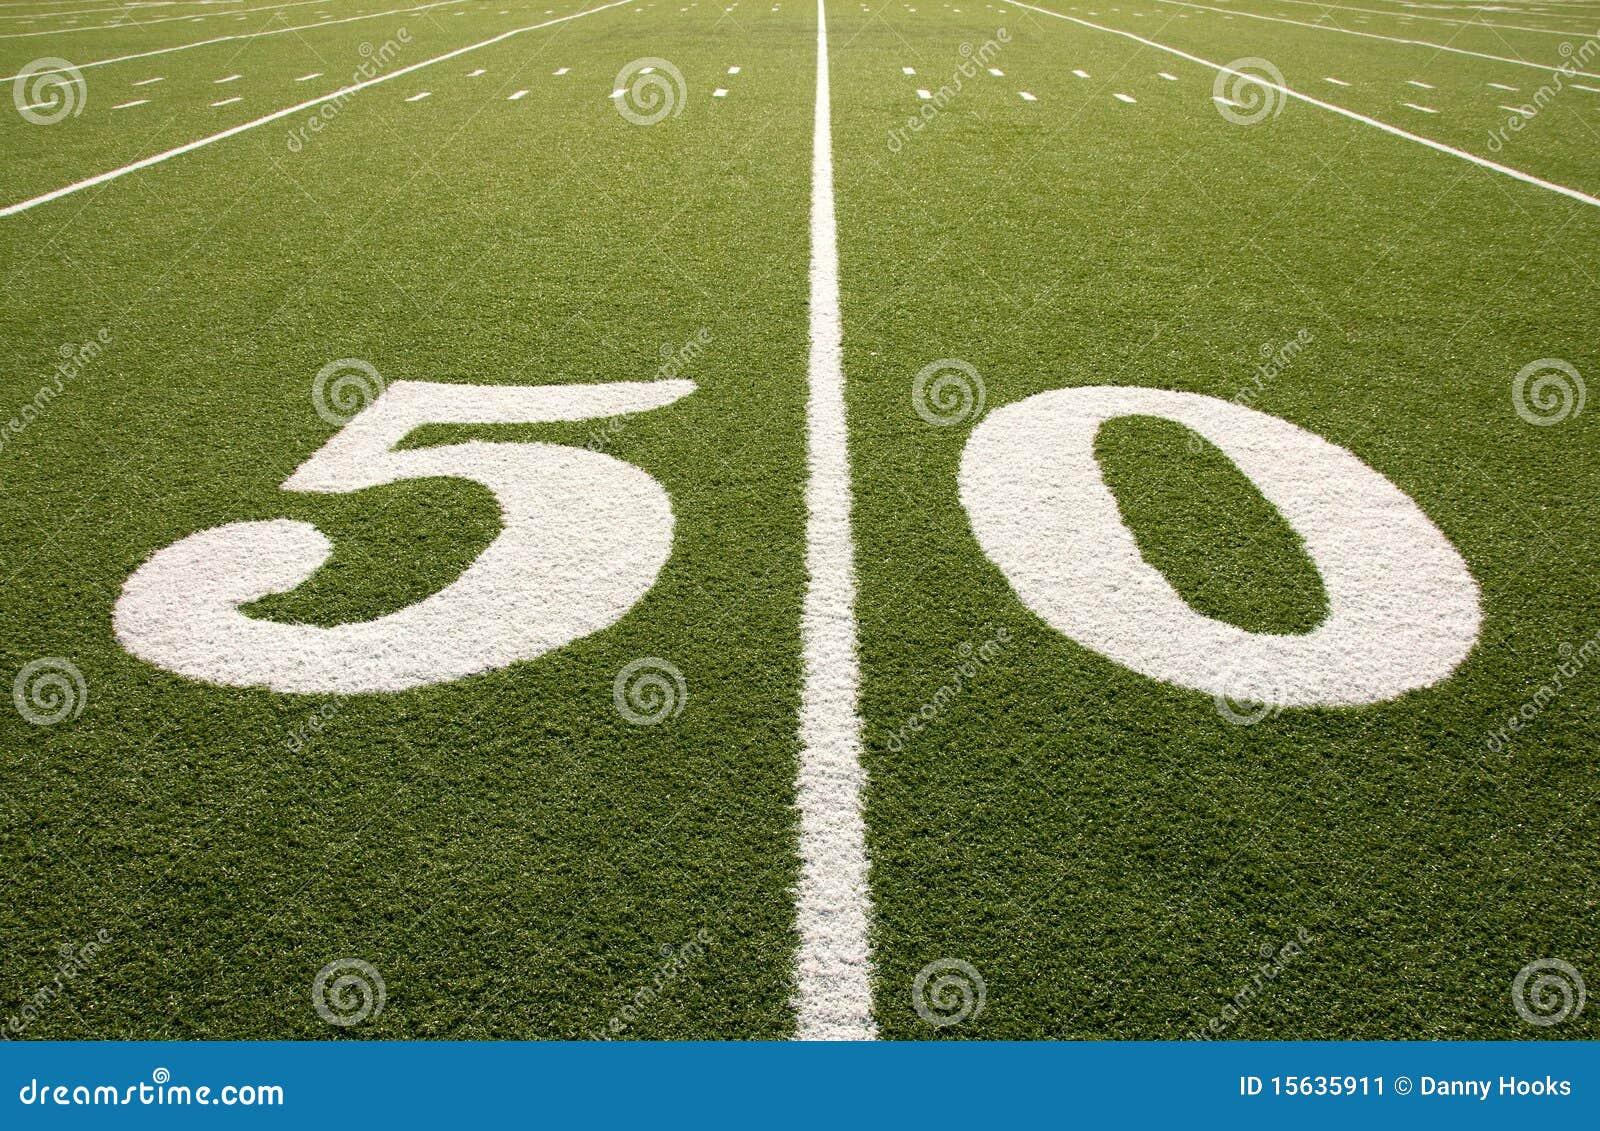 american football field 50 yard line closeup stock image